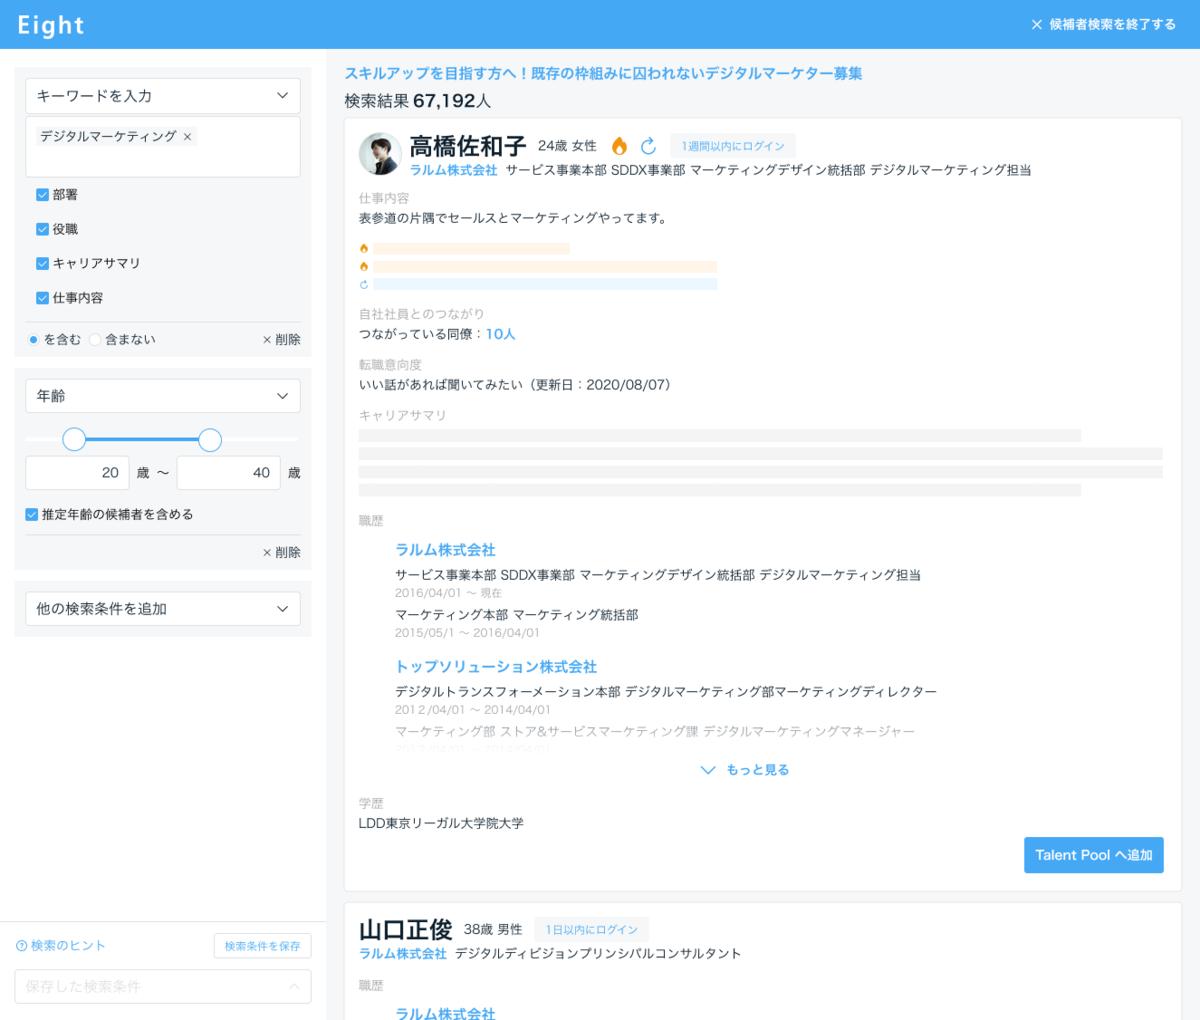 f:id:tokiwa123:20201204154304p:plain